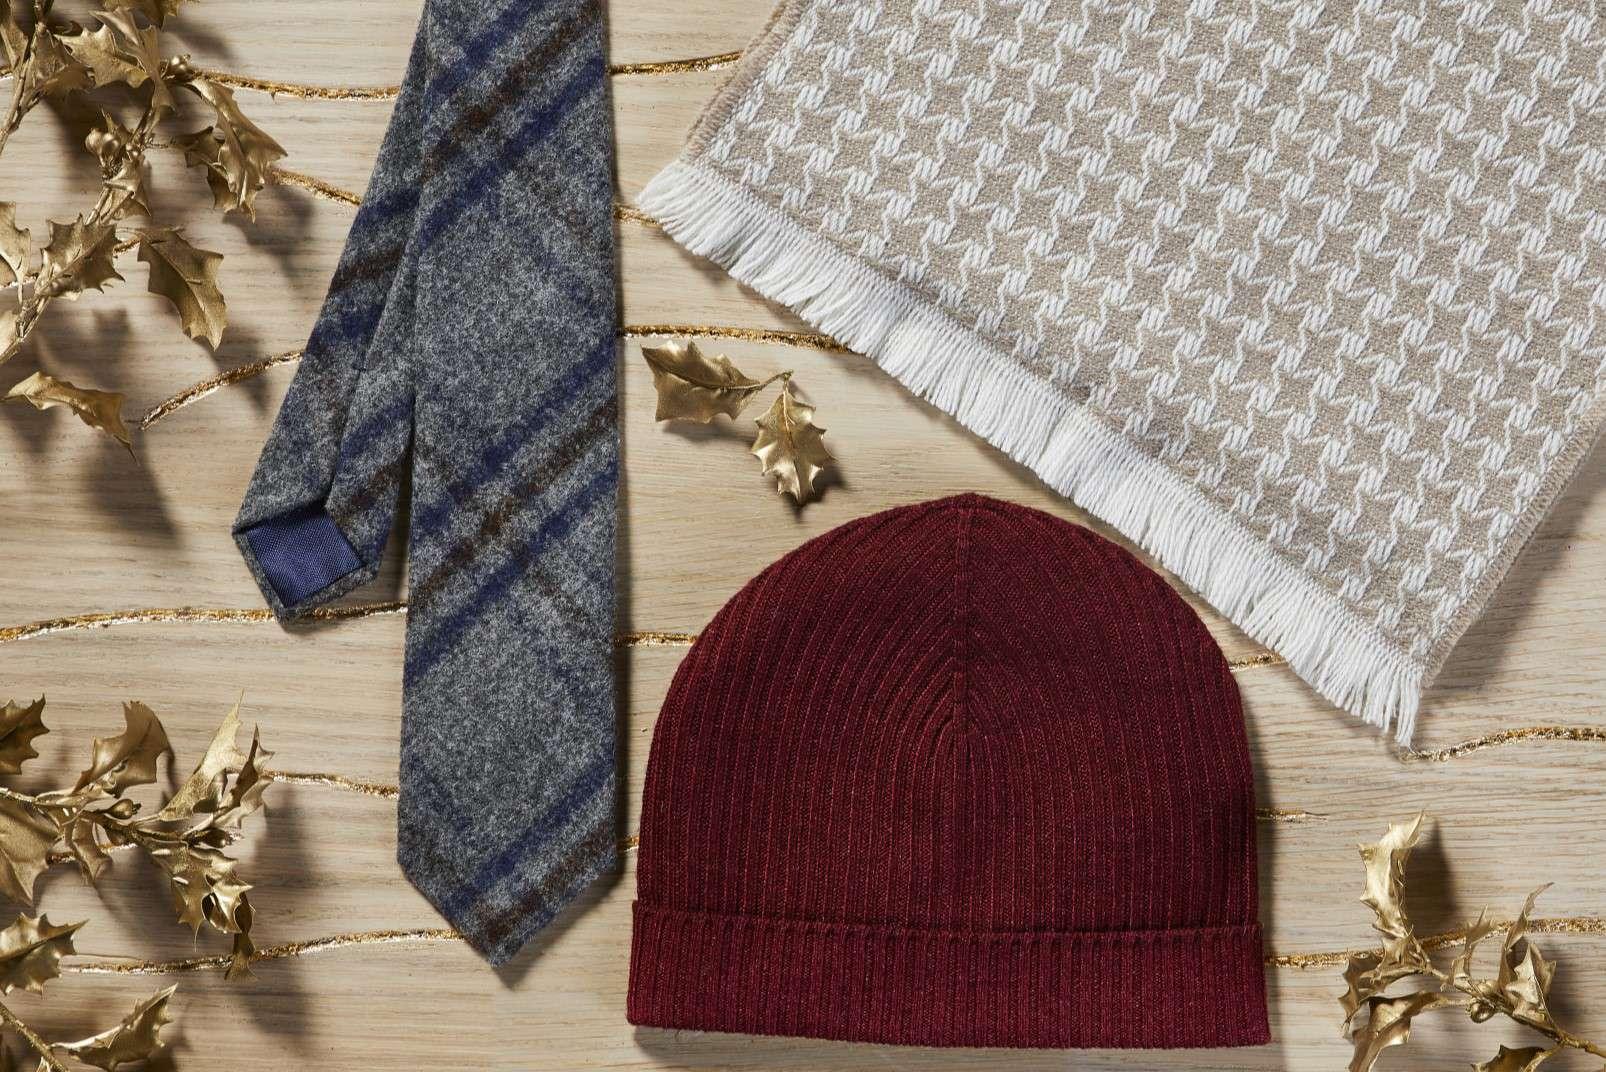 Boggi Milano gifts for a Gentleman - baby alpaca tie, cashmere scarf, cashmere hat